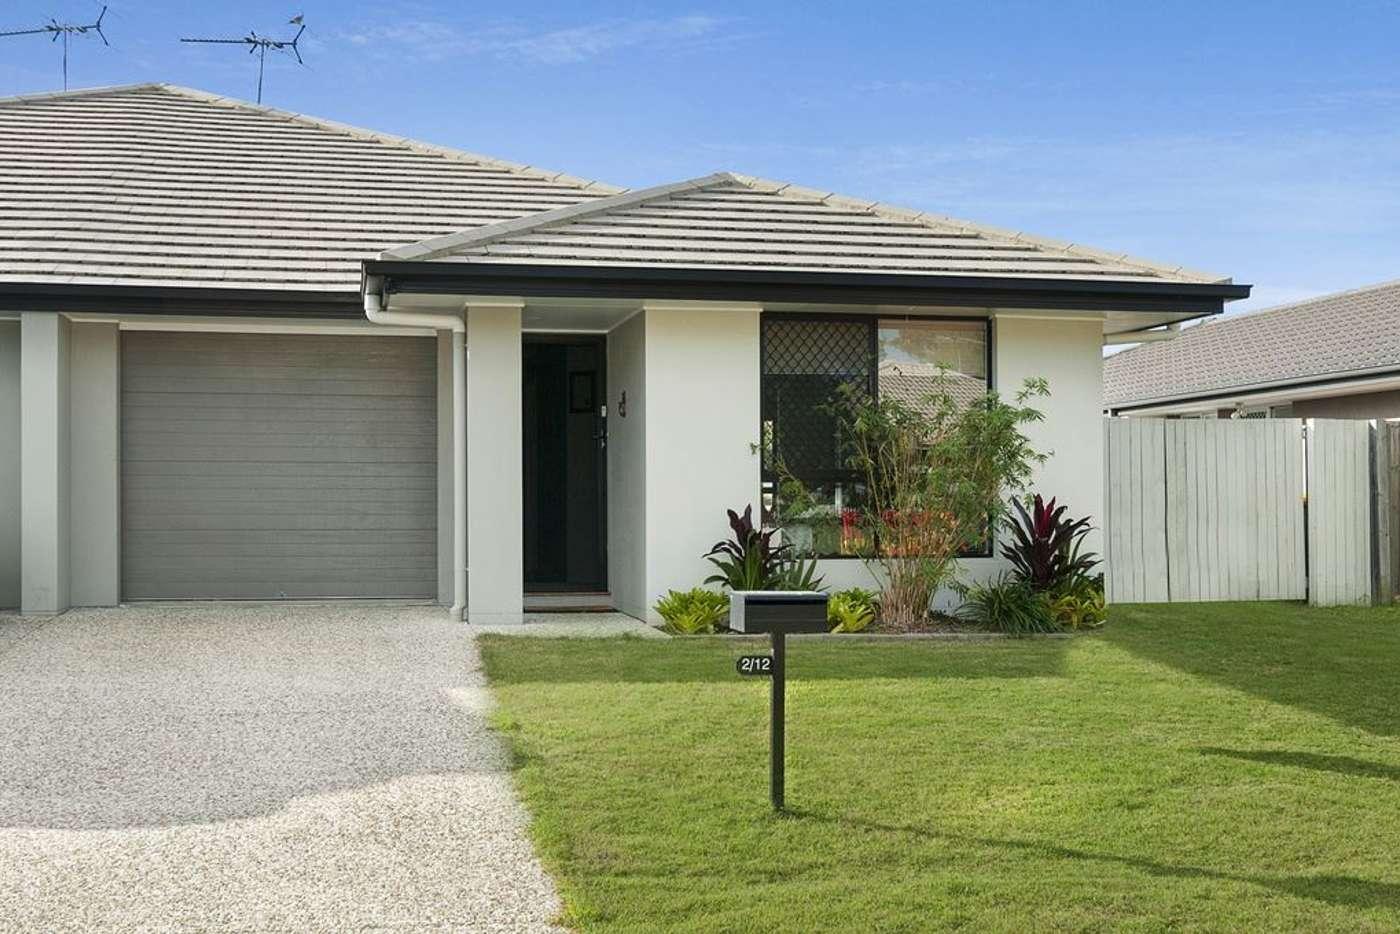 Main view of Homely semiDetached listing, 2/12 Maud Street, Bannockburn QLD 4207